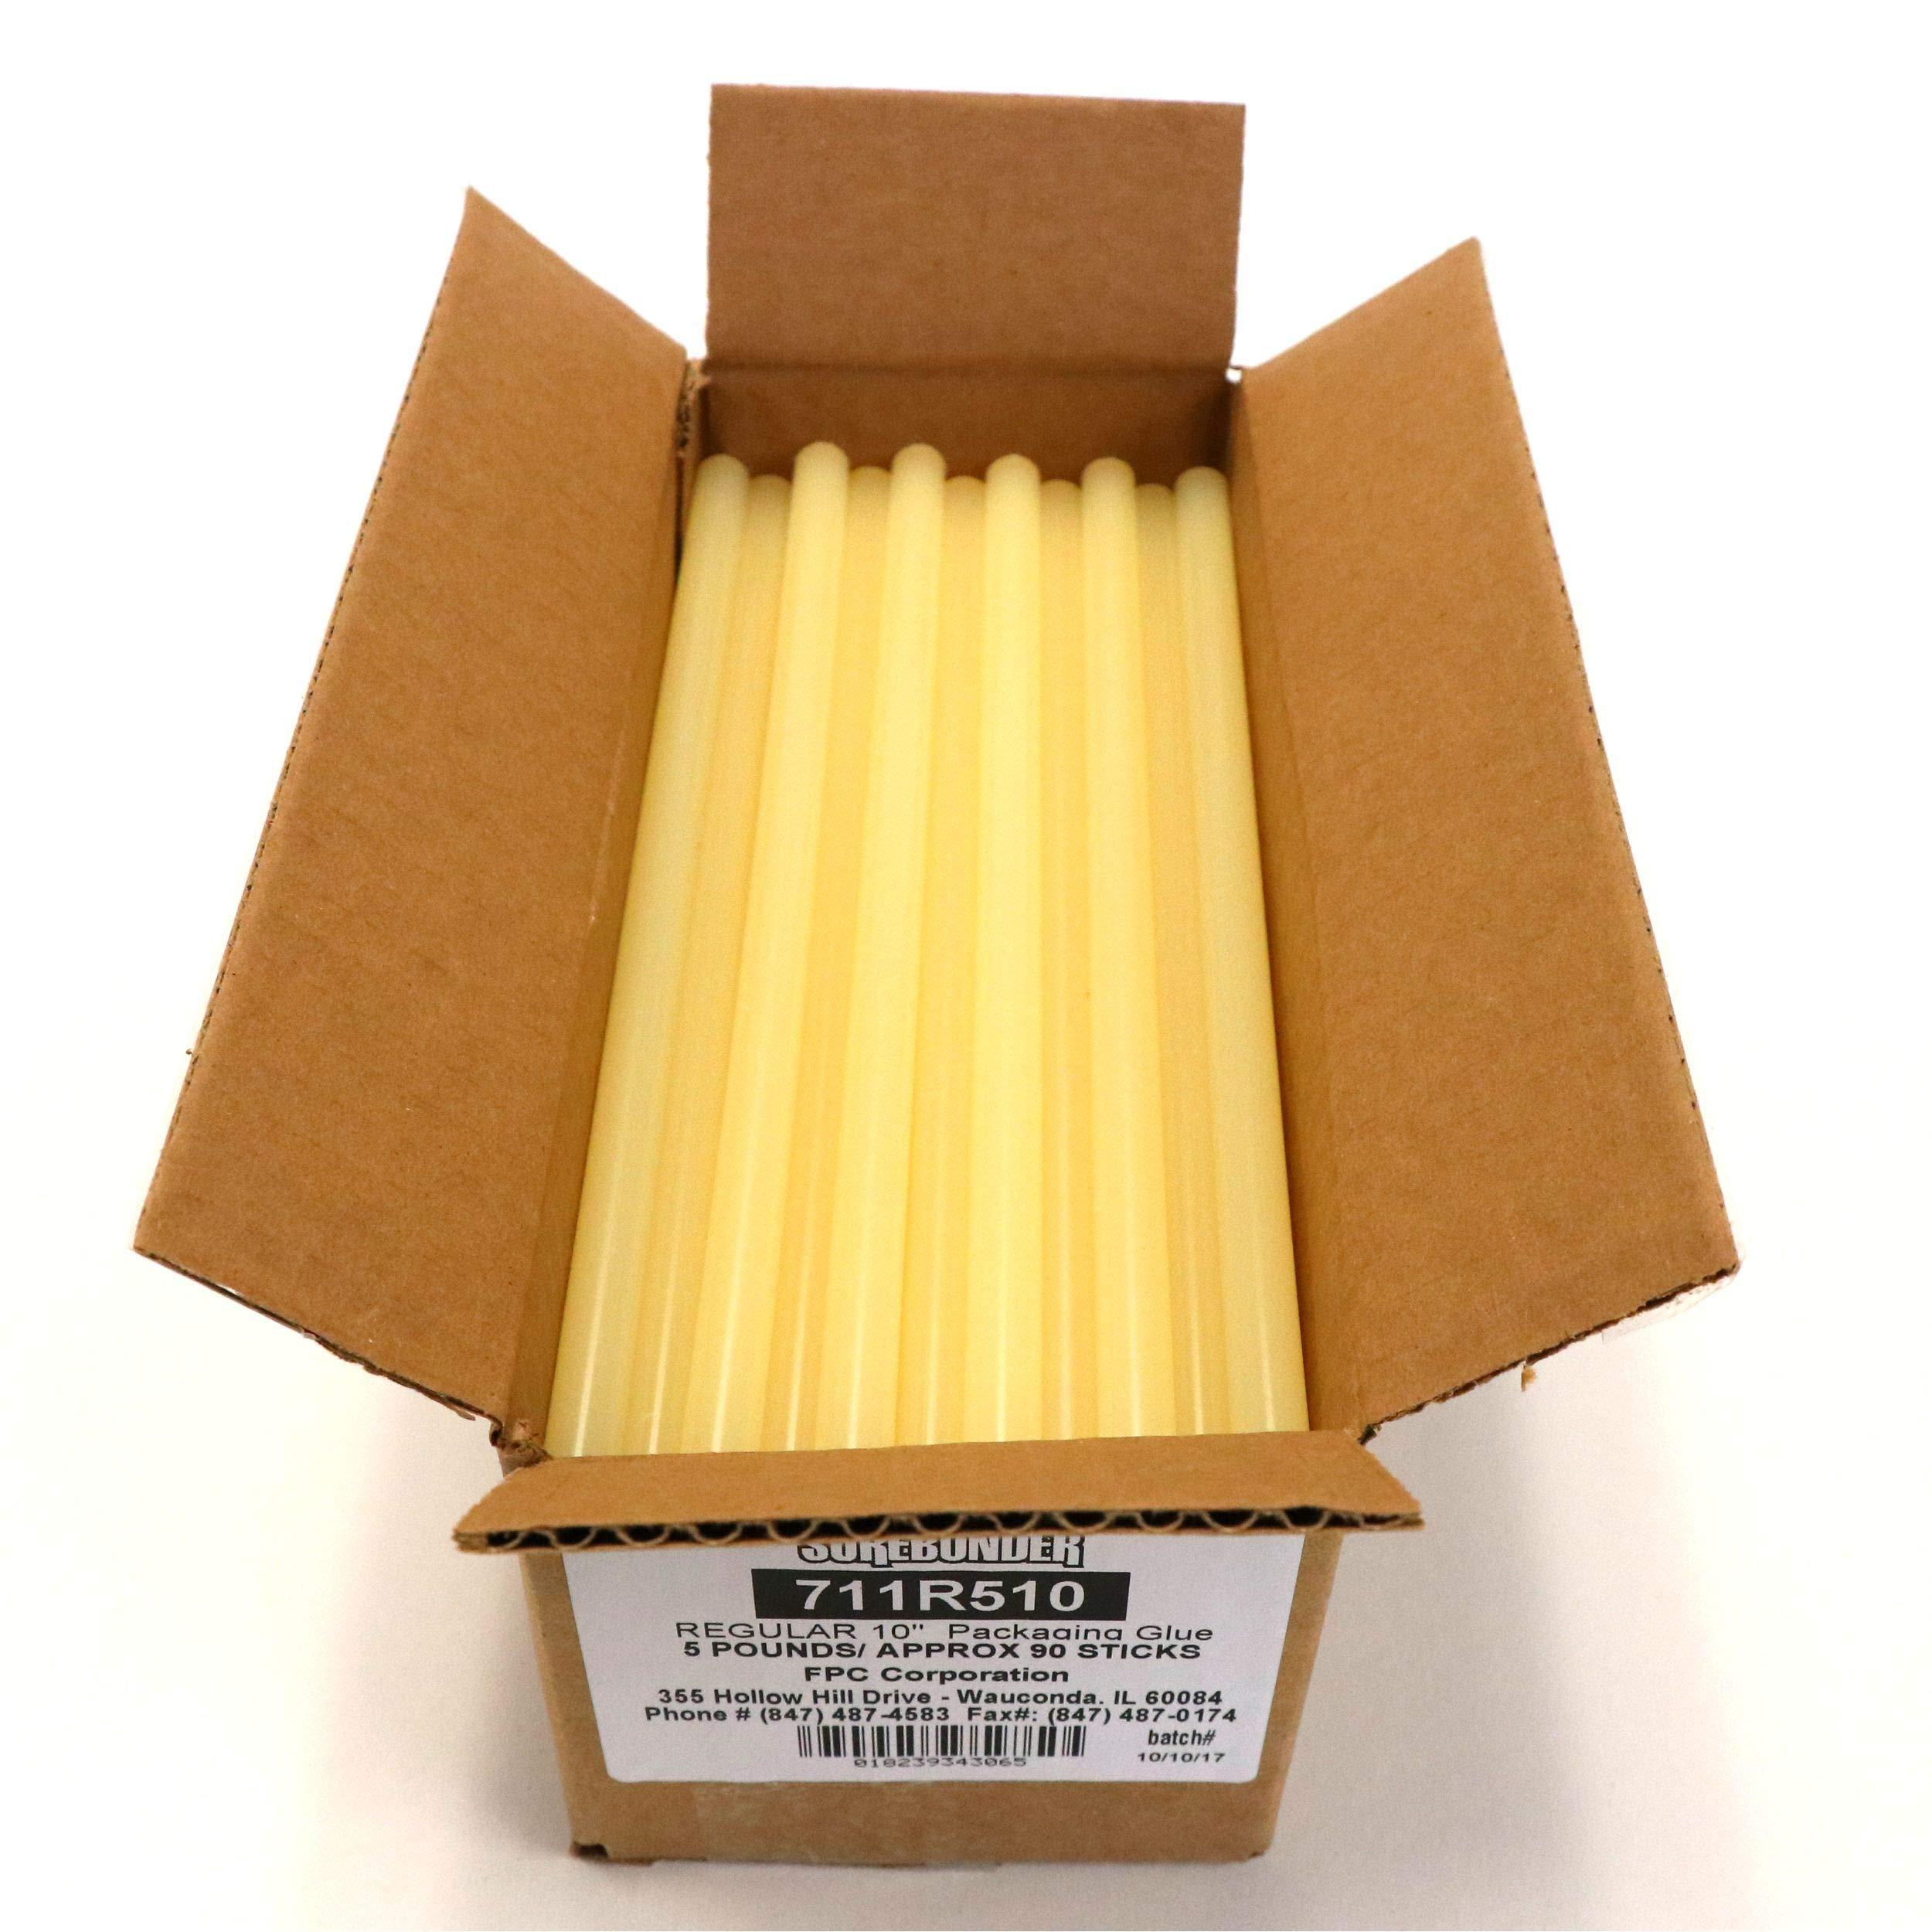 Surebonder 711R510 Fast Set Packaging Standard Glue Sticks, Made in the USA, 7/16'' x 10'' Length, 5 lb. Box, Light Amber, 90 Sticks (Pack of 90)